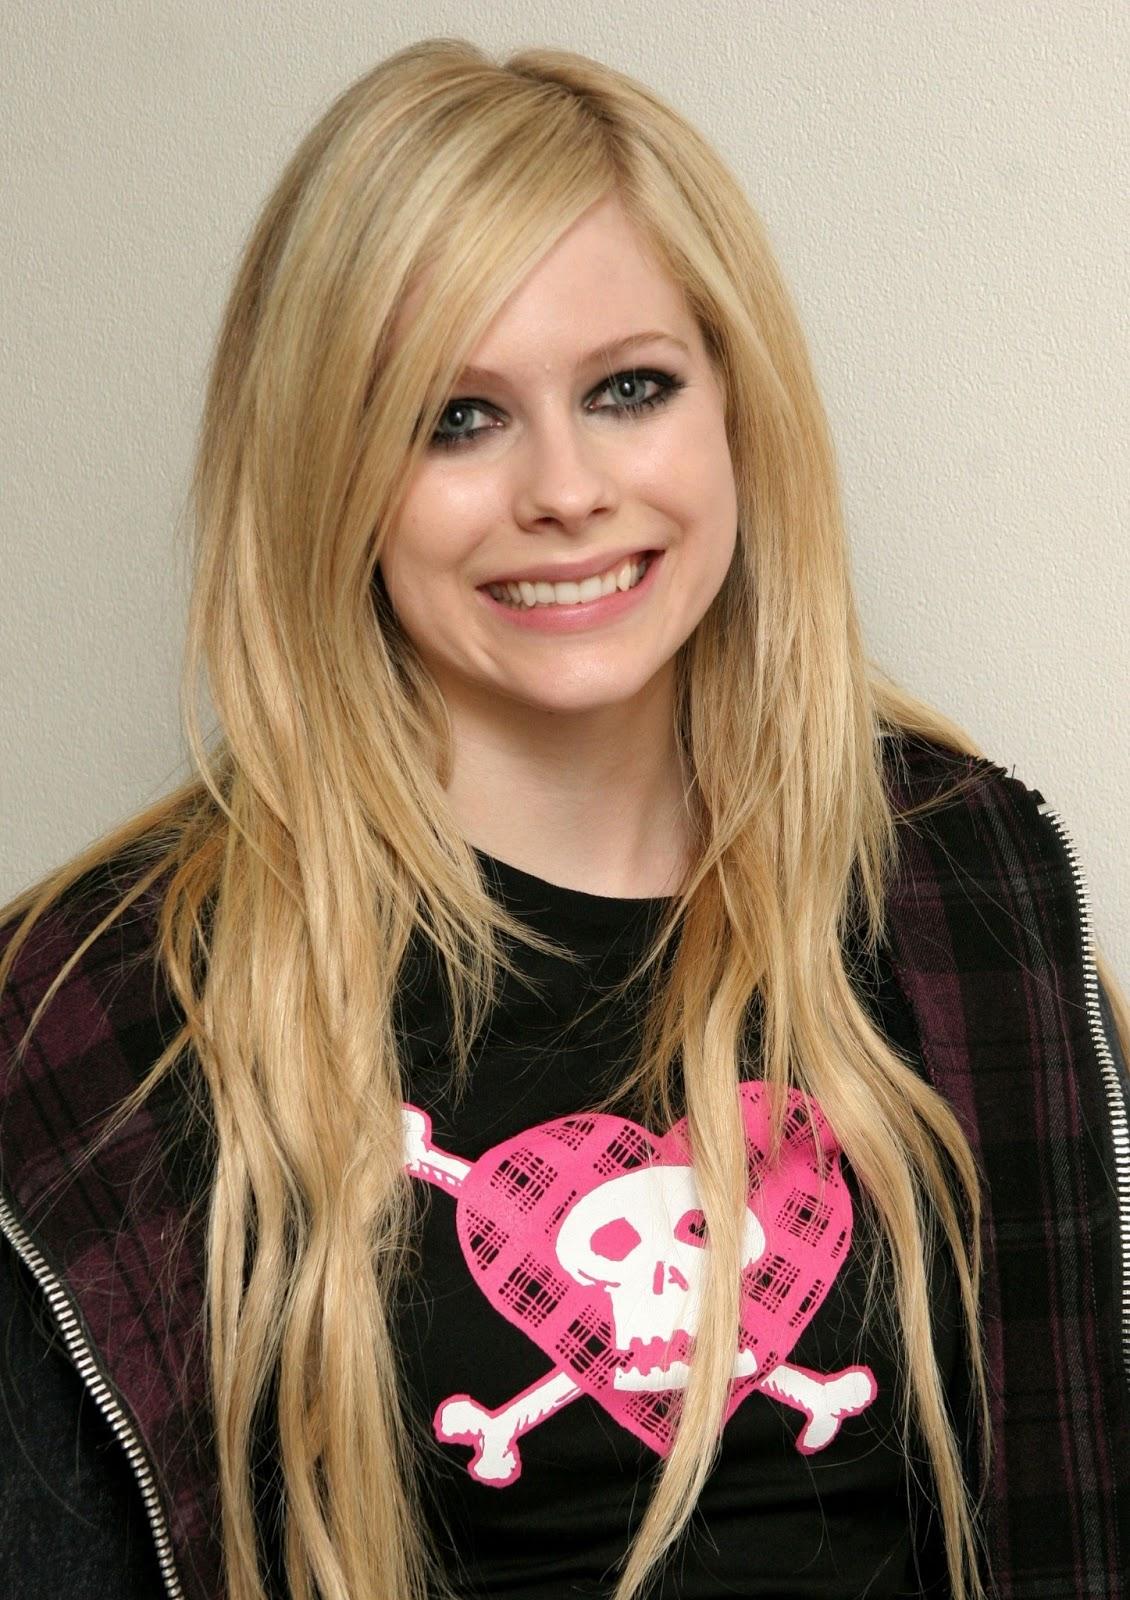 Avril Lavigne HairStyles (Women HairStyles) - Women Hair ...